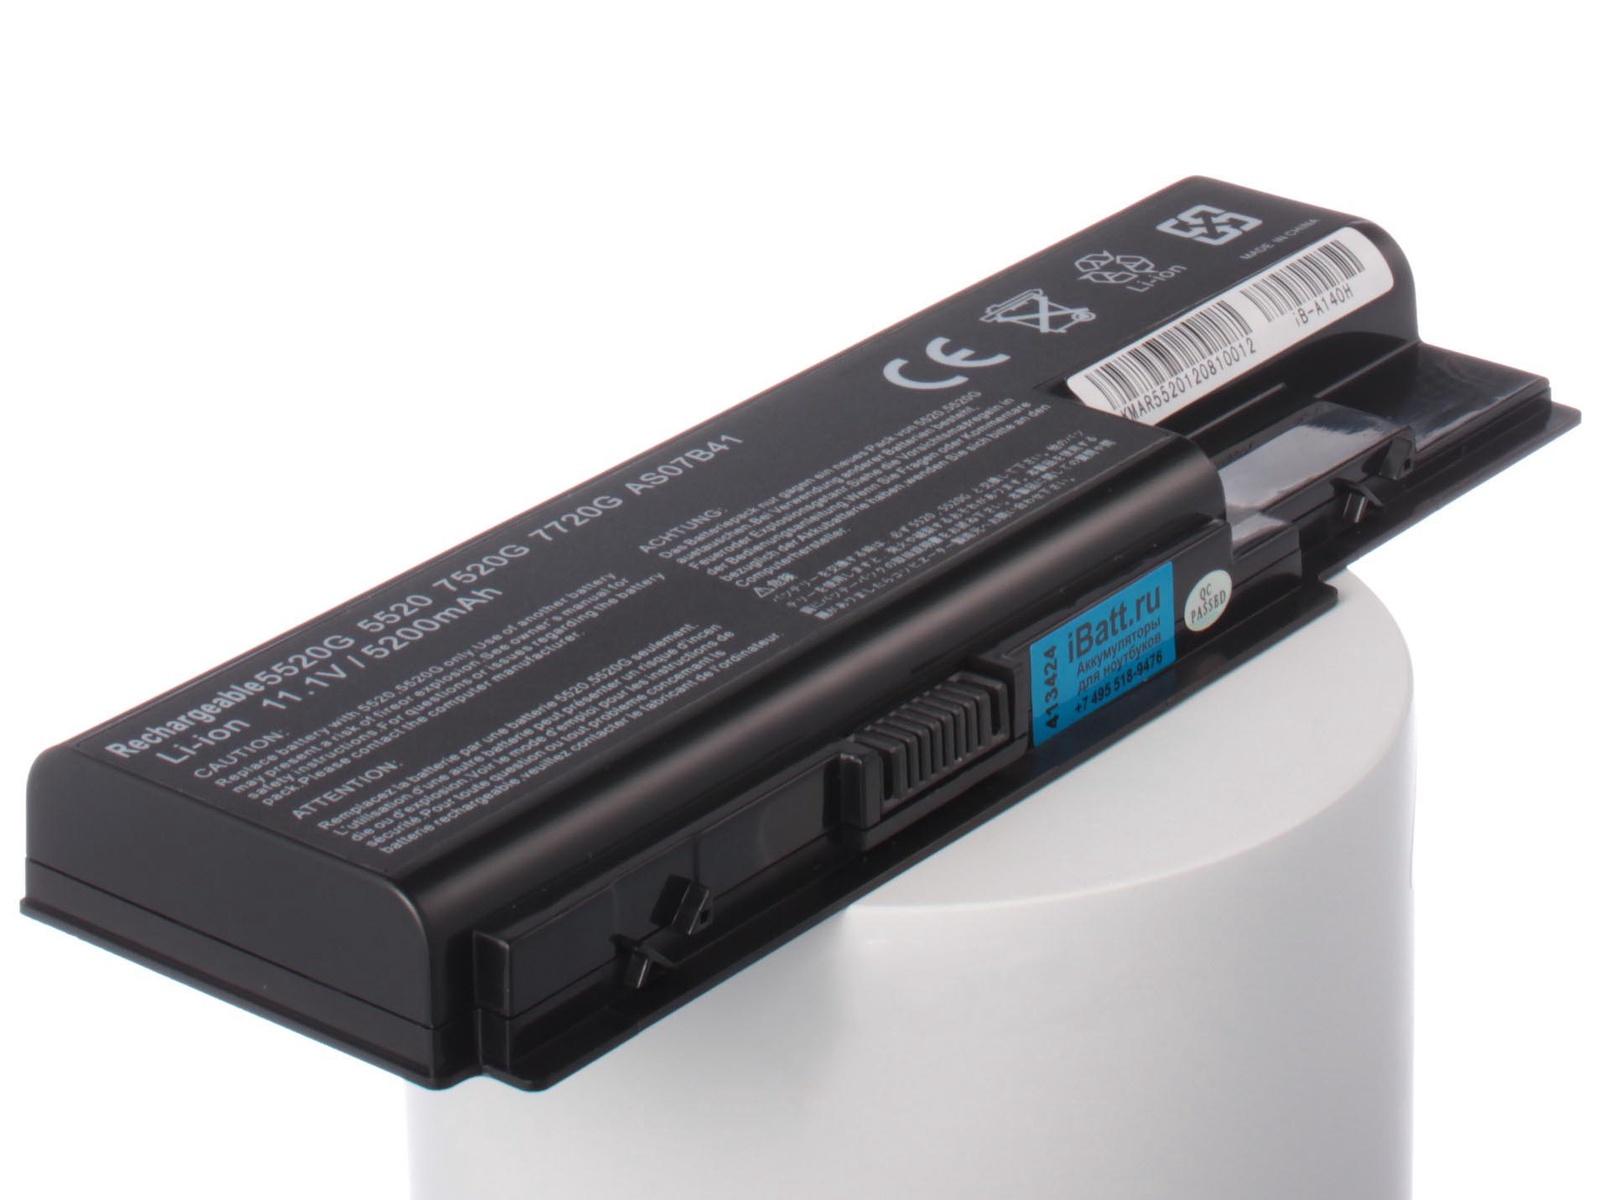 Аккумулятор для ноутбука iBatt для Acer Aspire 5925G, Aspire 5930G-844G32BN, Aspire 7720Z-1A2G16MI, Aspire 7720ZG-2A2G25Mi, Aspire 7738G-904G100Bi, Aspire 8920G-6A4G32BN, Aspire 8935G-654G32Mi, Aspire 8942G-434G50Mi 8cell 14 8v as07b31 original laptop battery for acer aspire as07b32 5520 5720 5920g 5930g 6920g 6930g 7520g 7330 5930g as07b51